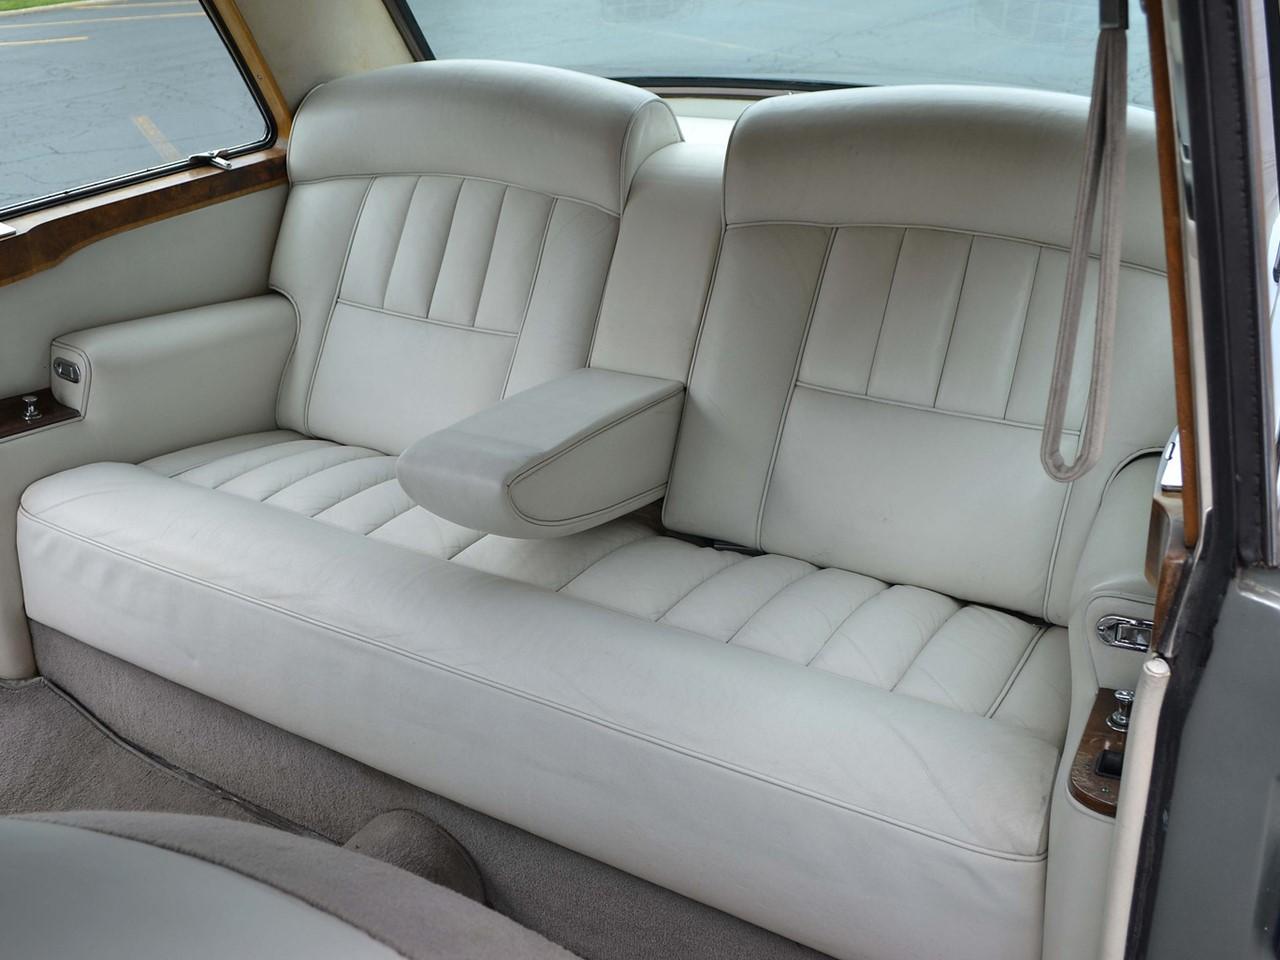 1967 MPW Fixedhead coupe 6